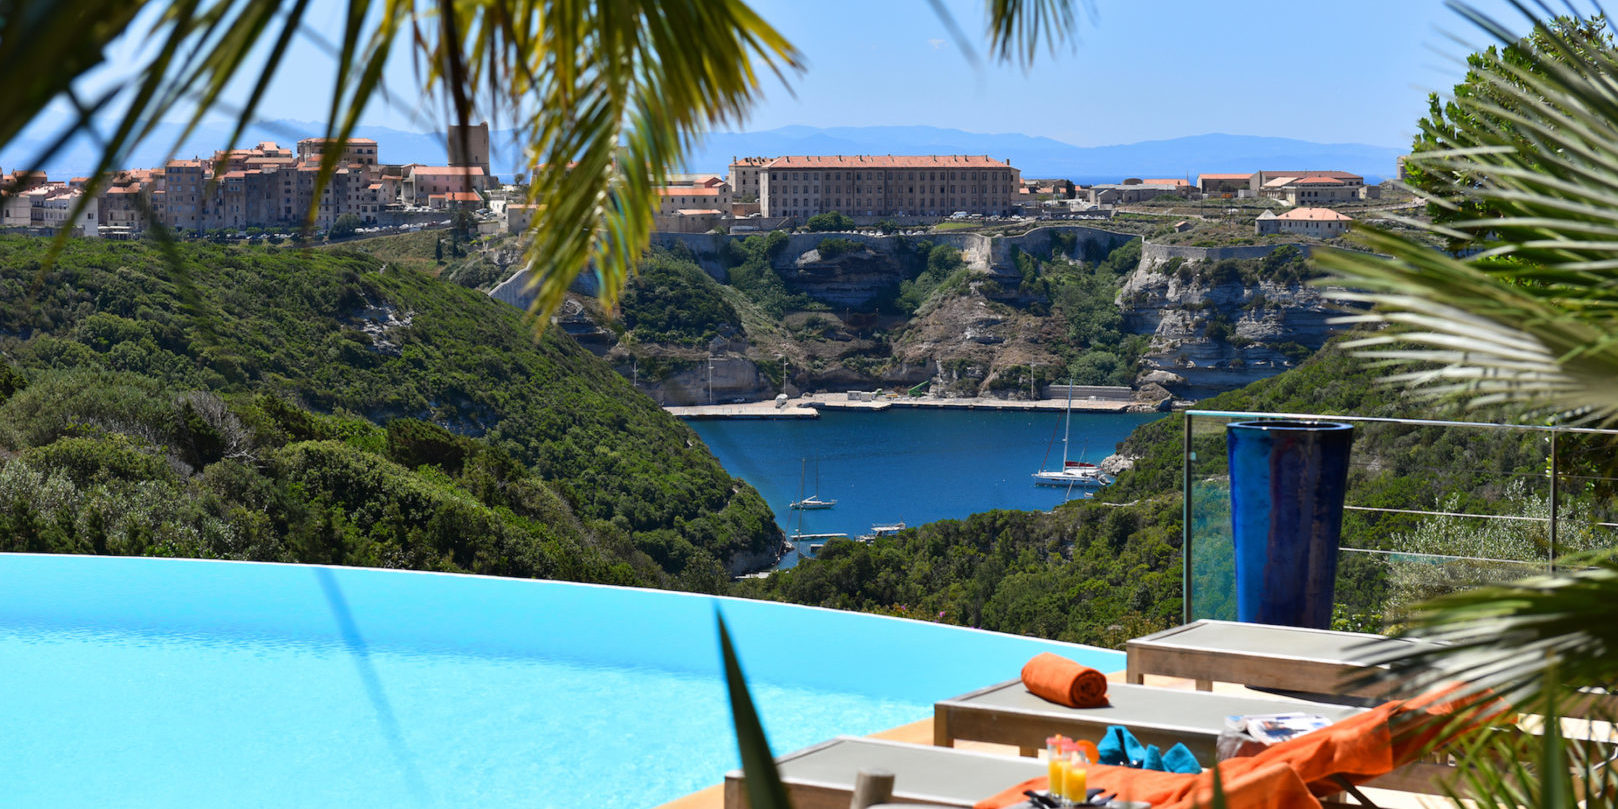 Hotel Cala di Greco Bonifacio Corsica Zuid-Corsica Frankrijk zwembad uitzicht-op-Bonifacio